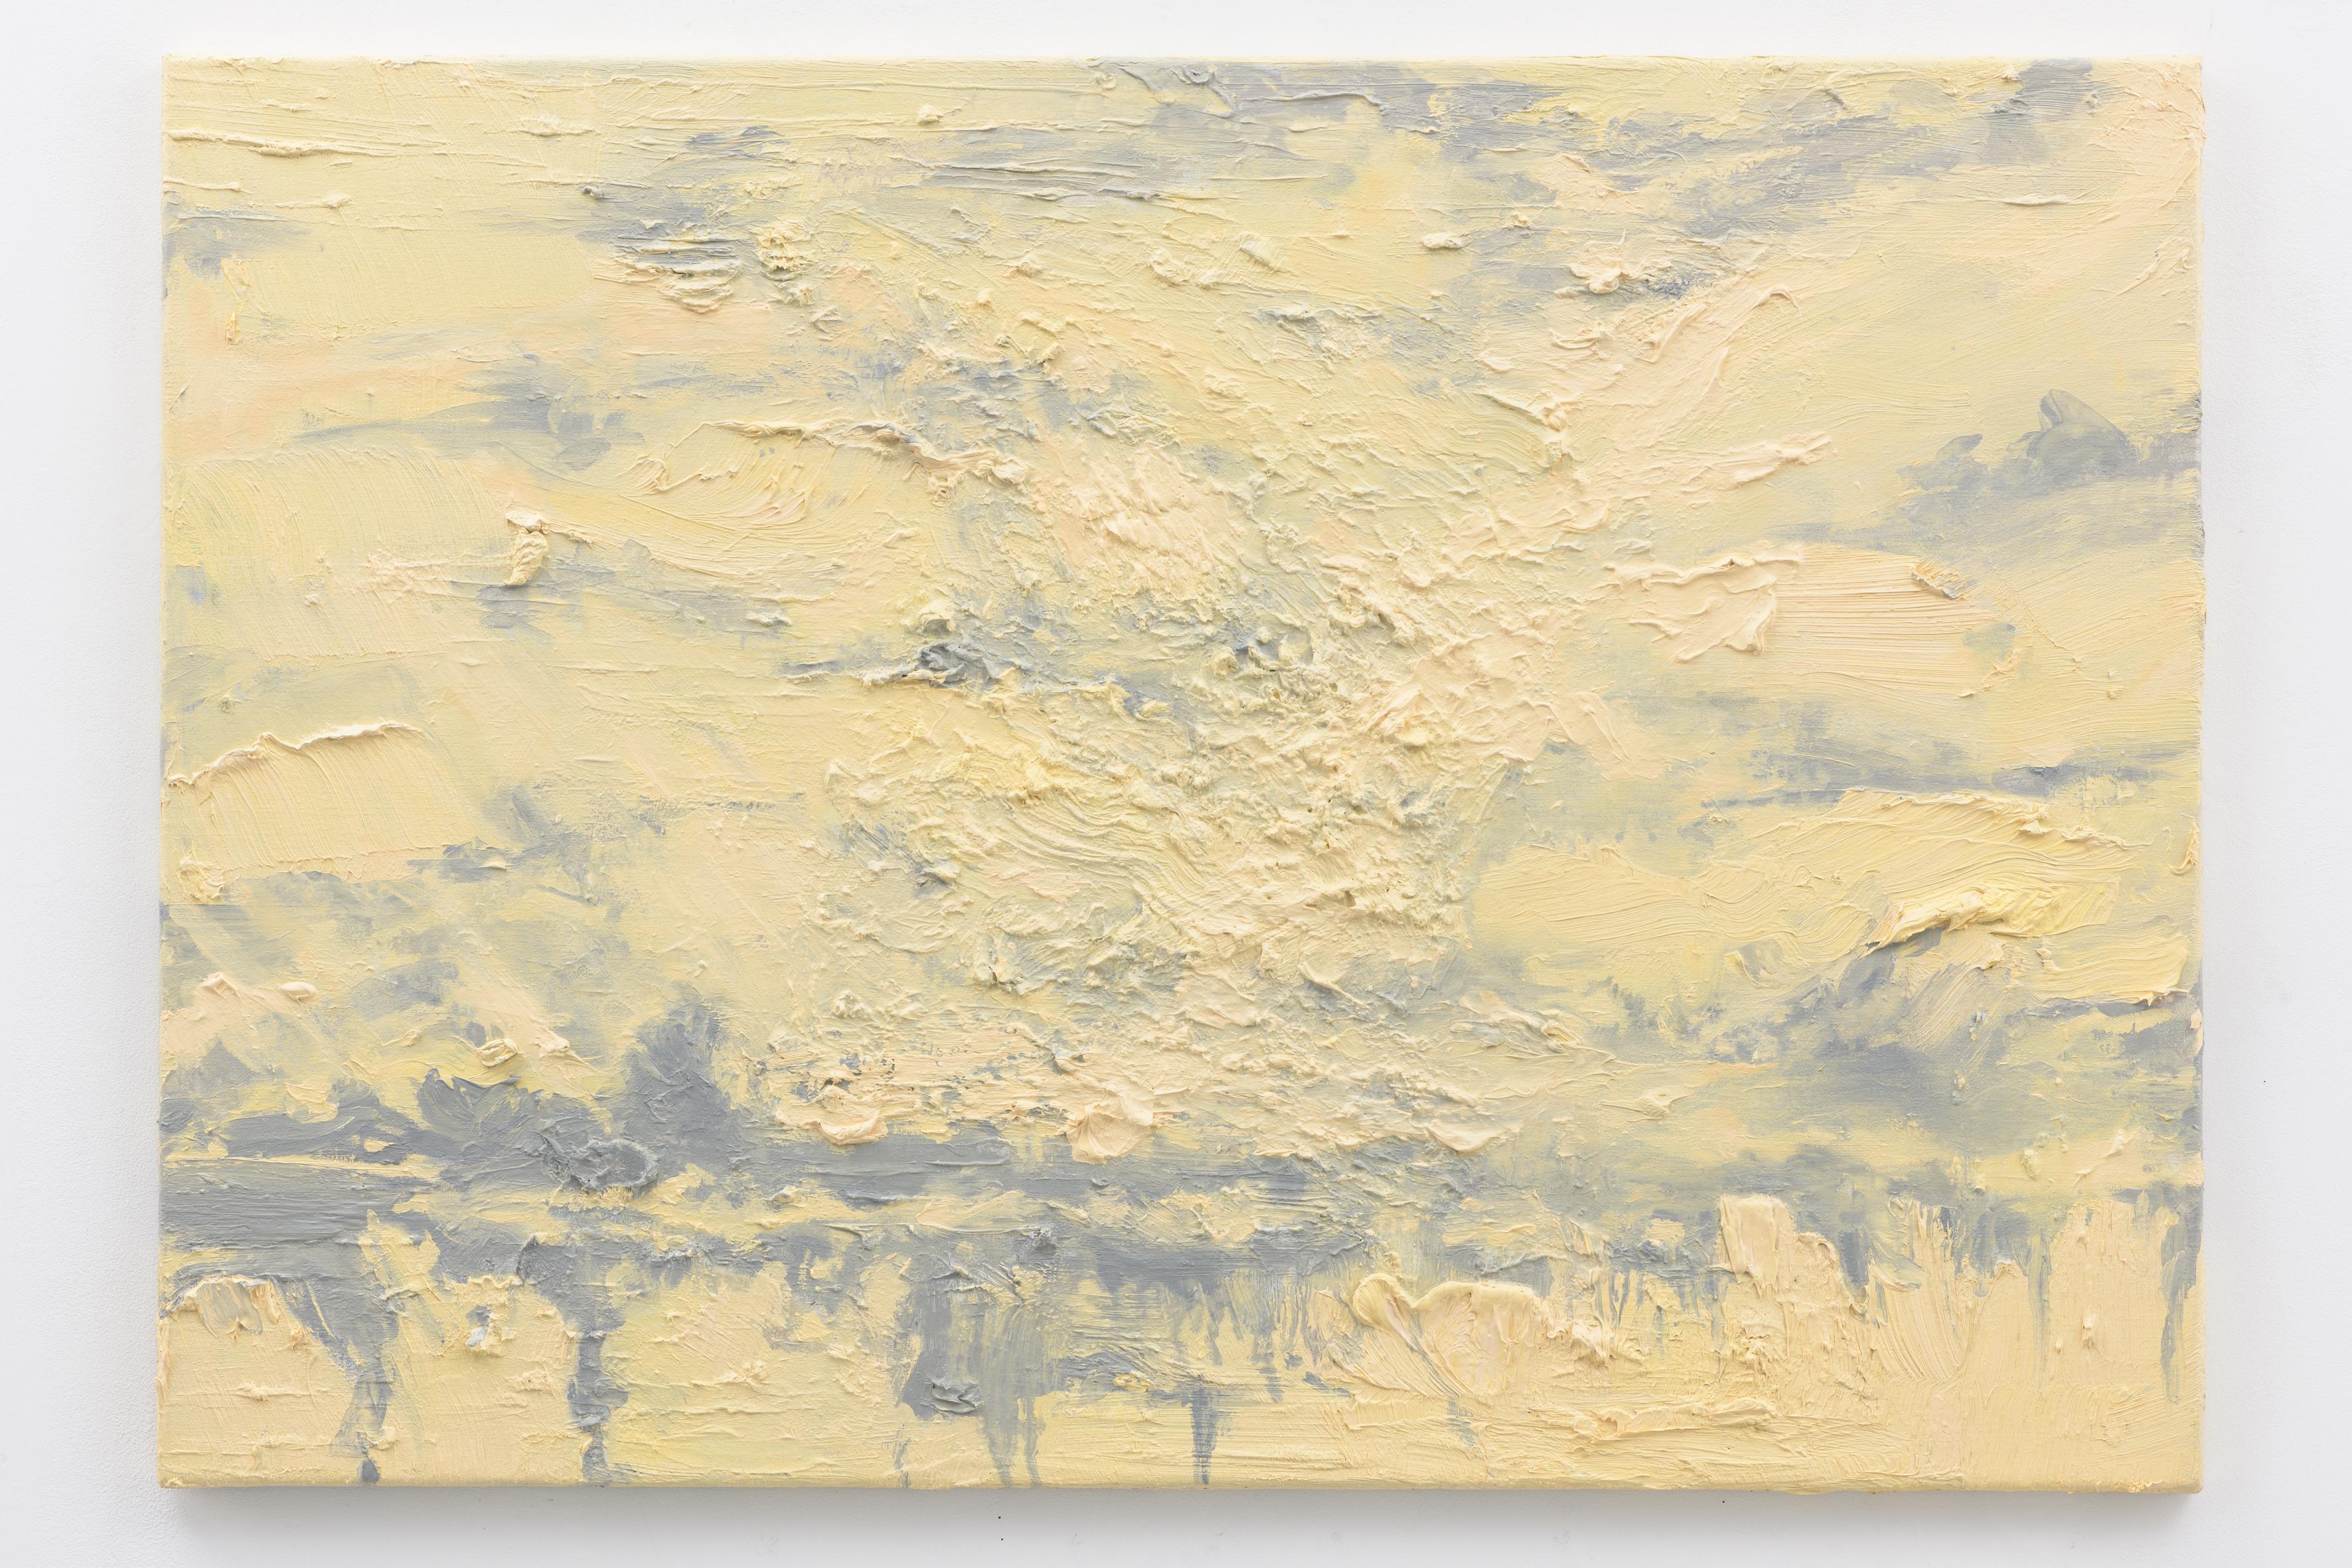 """Mirrored Waters V"", 70 x 100 cm., oil on linen 2017 (Van Gogh)"